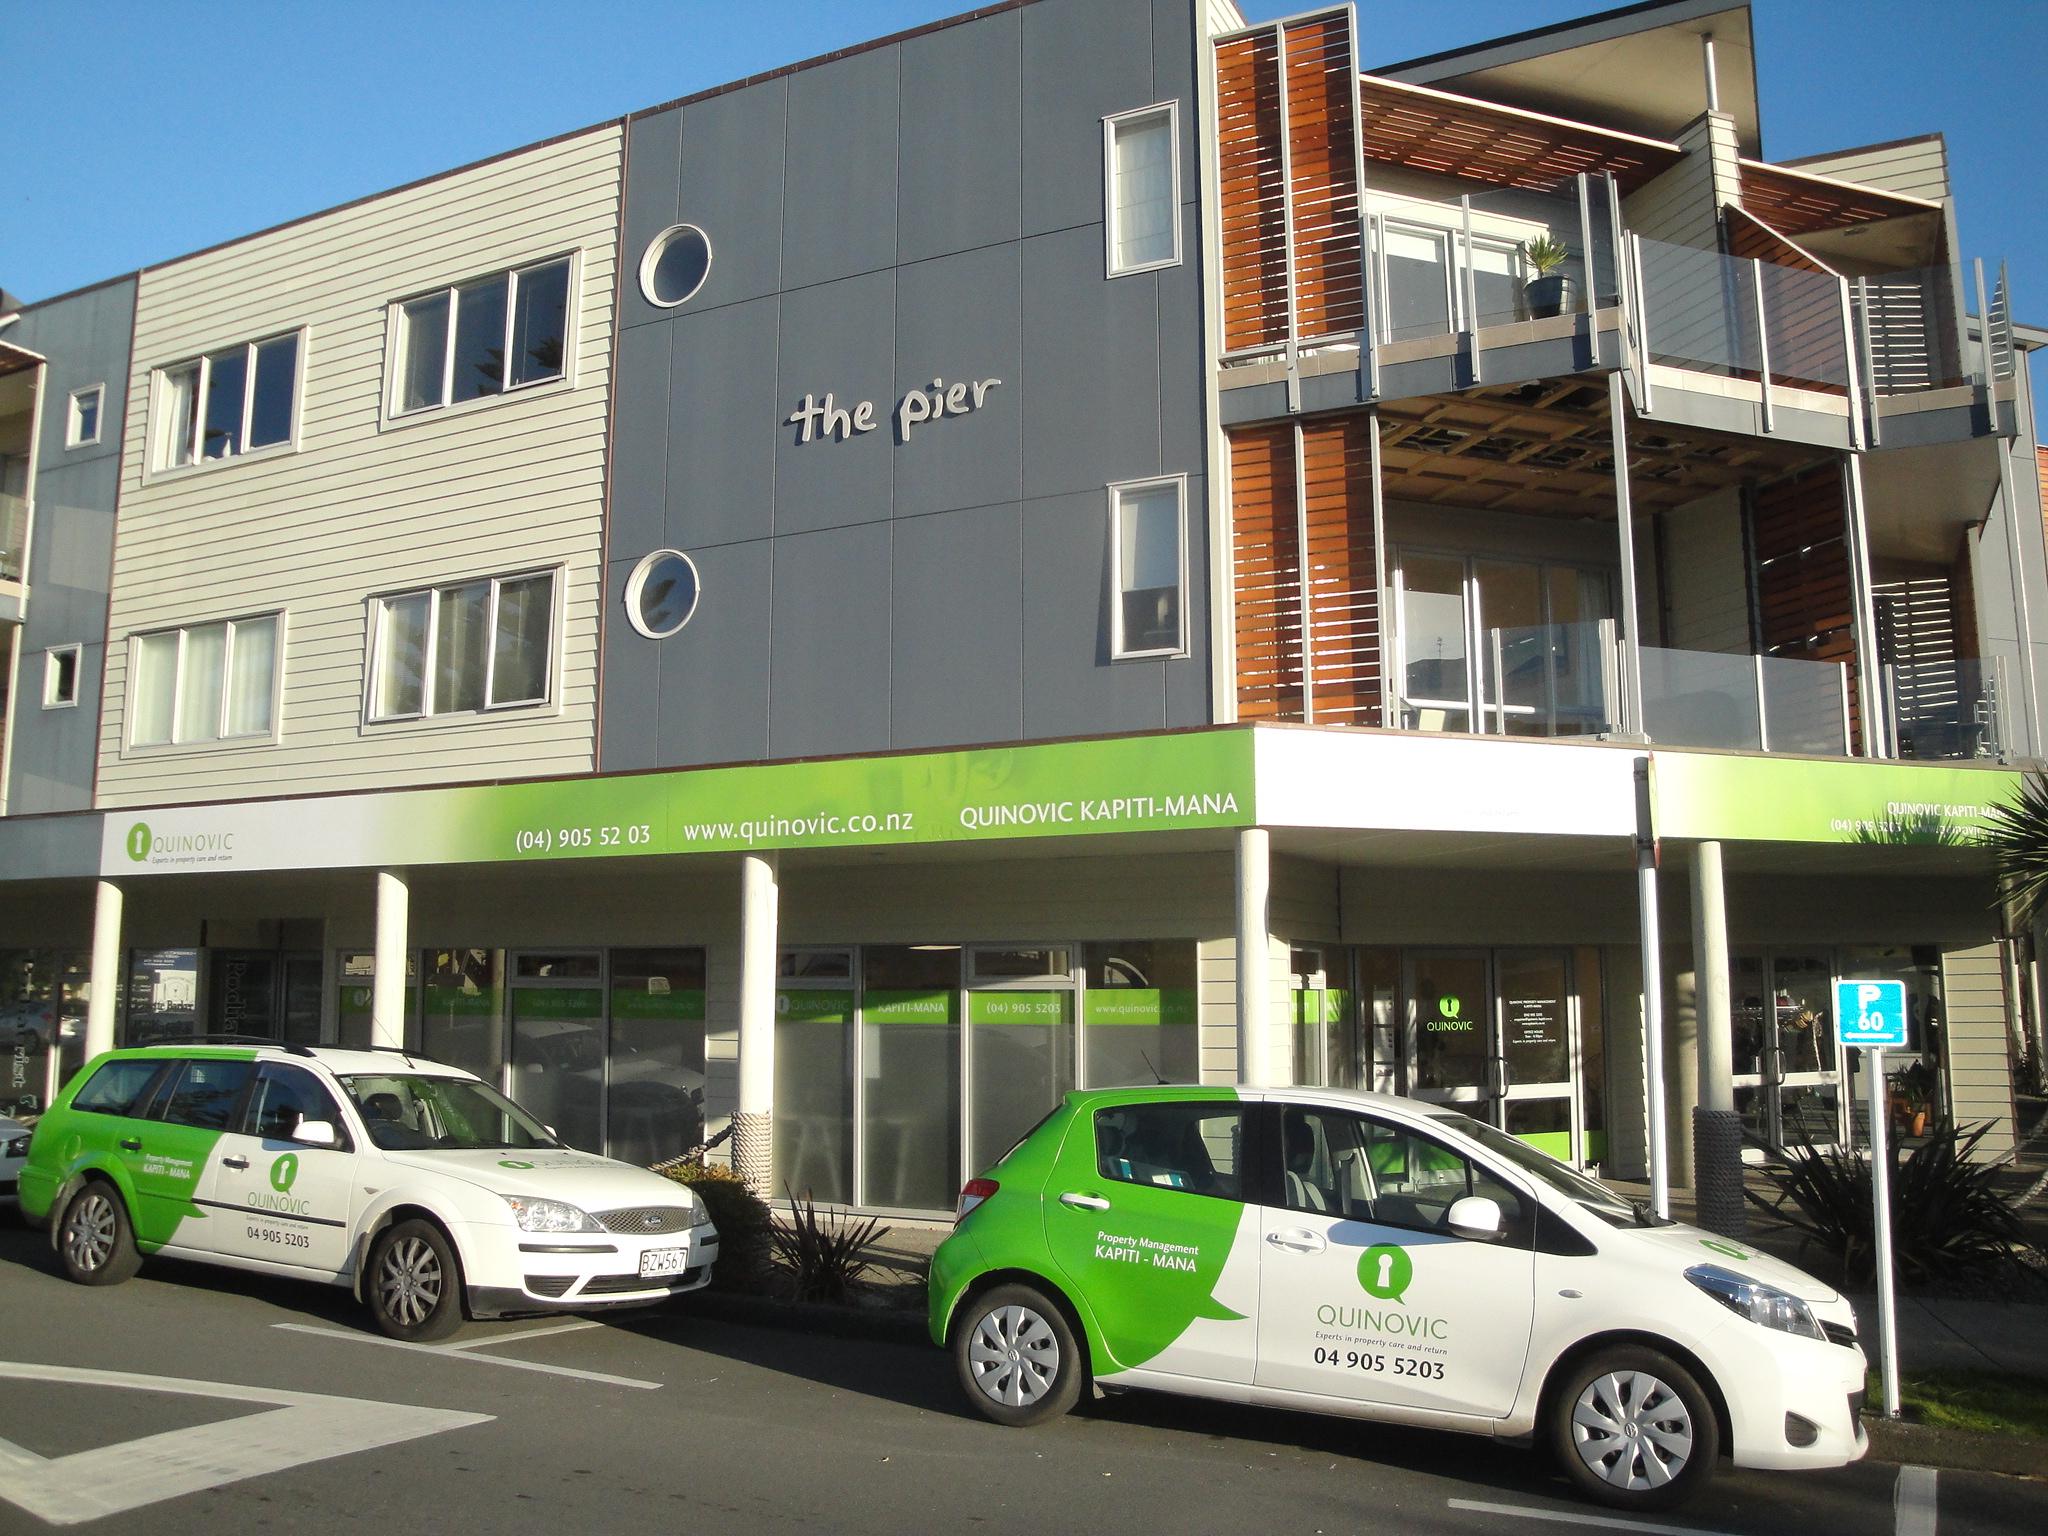 Quinovic Property Management - Kapiti-Mana, Wellington